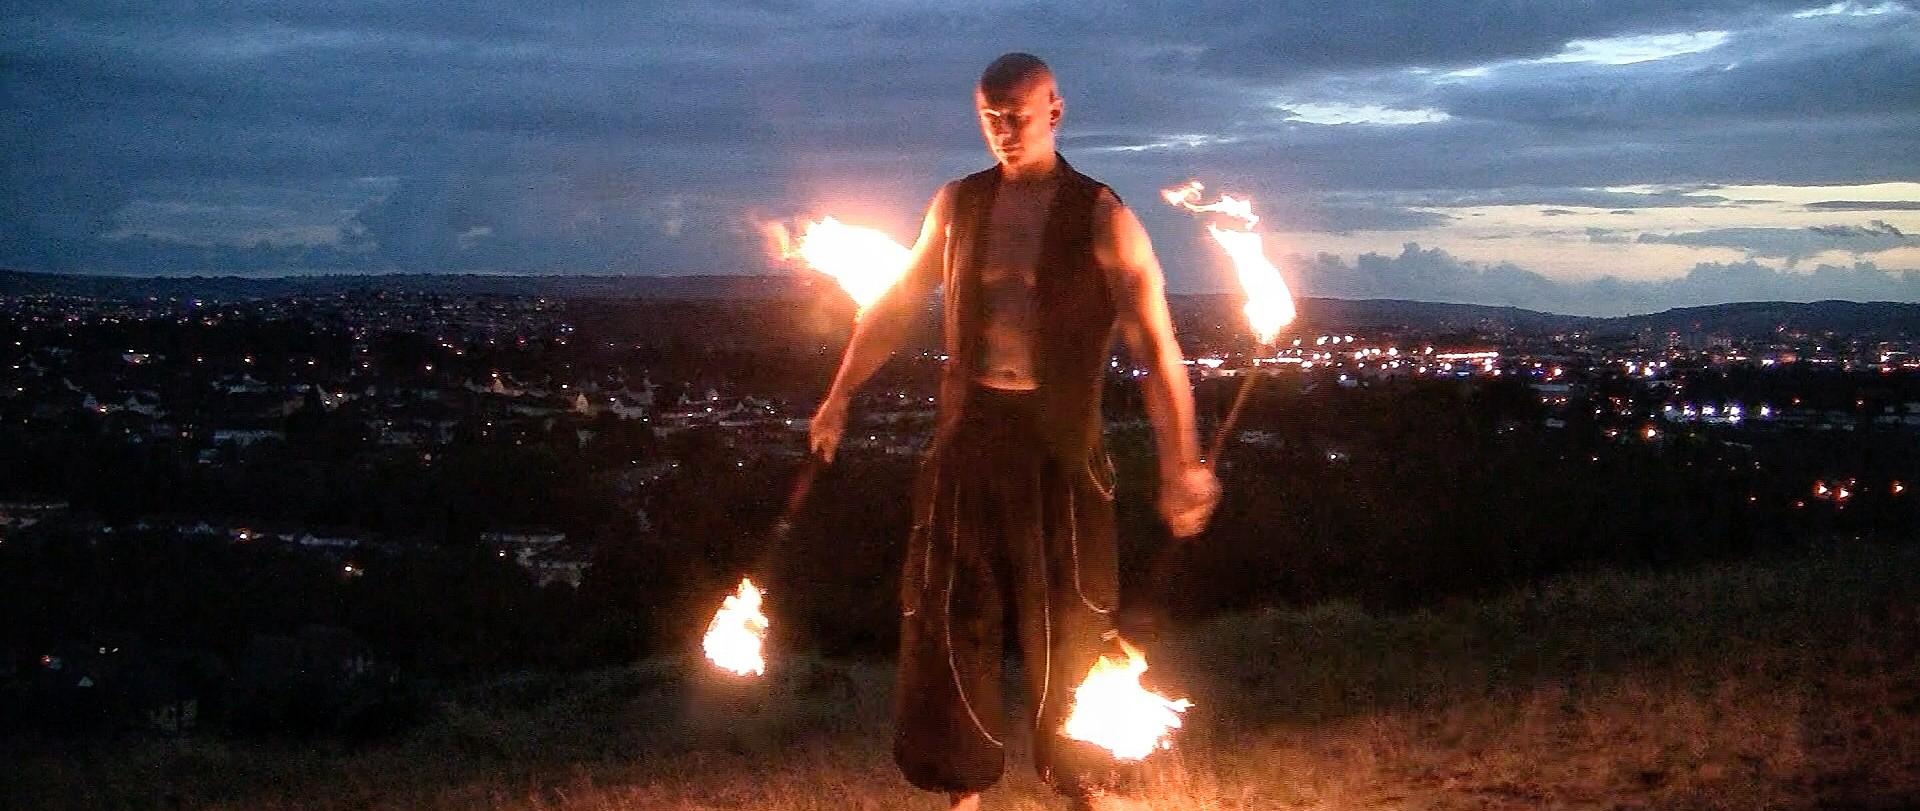 Fire Spinner Circus - Bristol - Bath - 07747571426 benlowrey@me.com